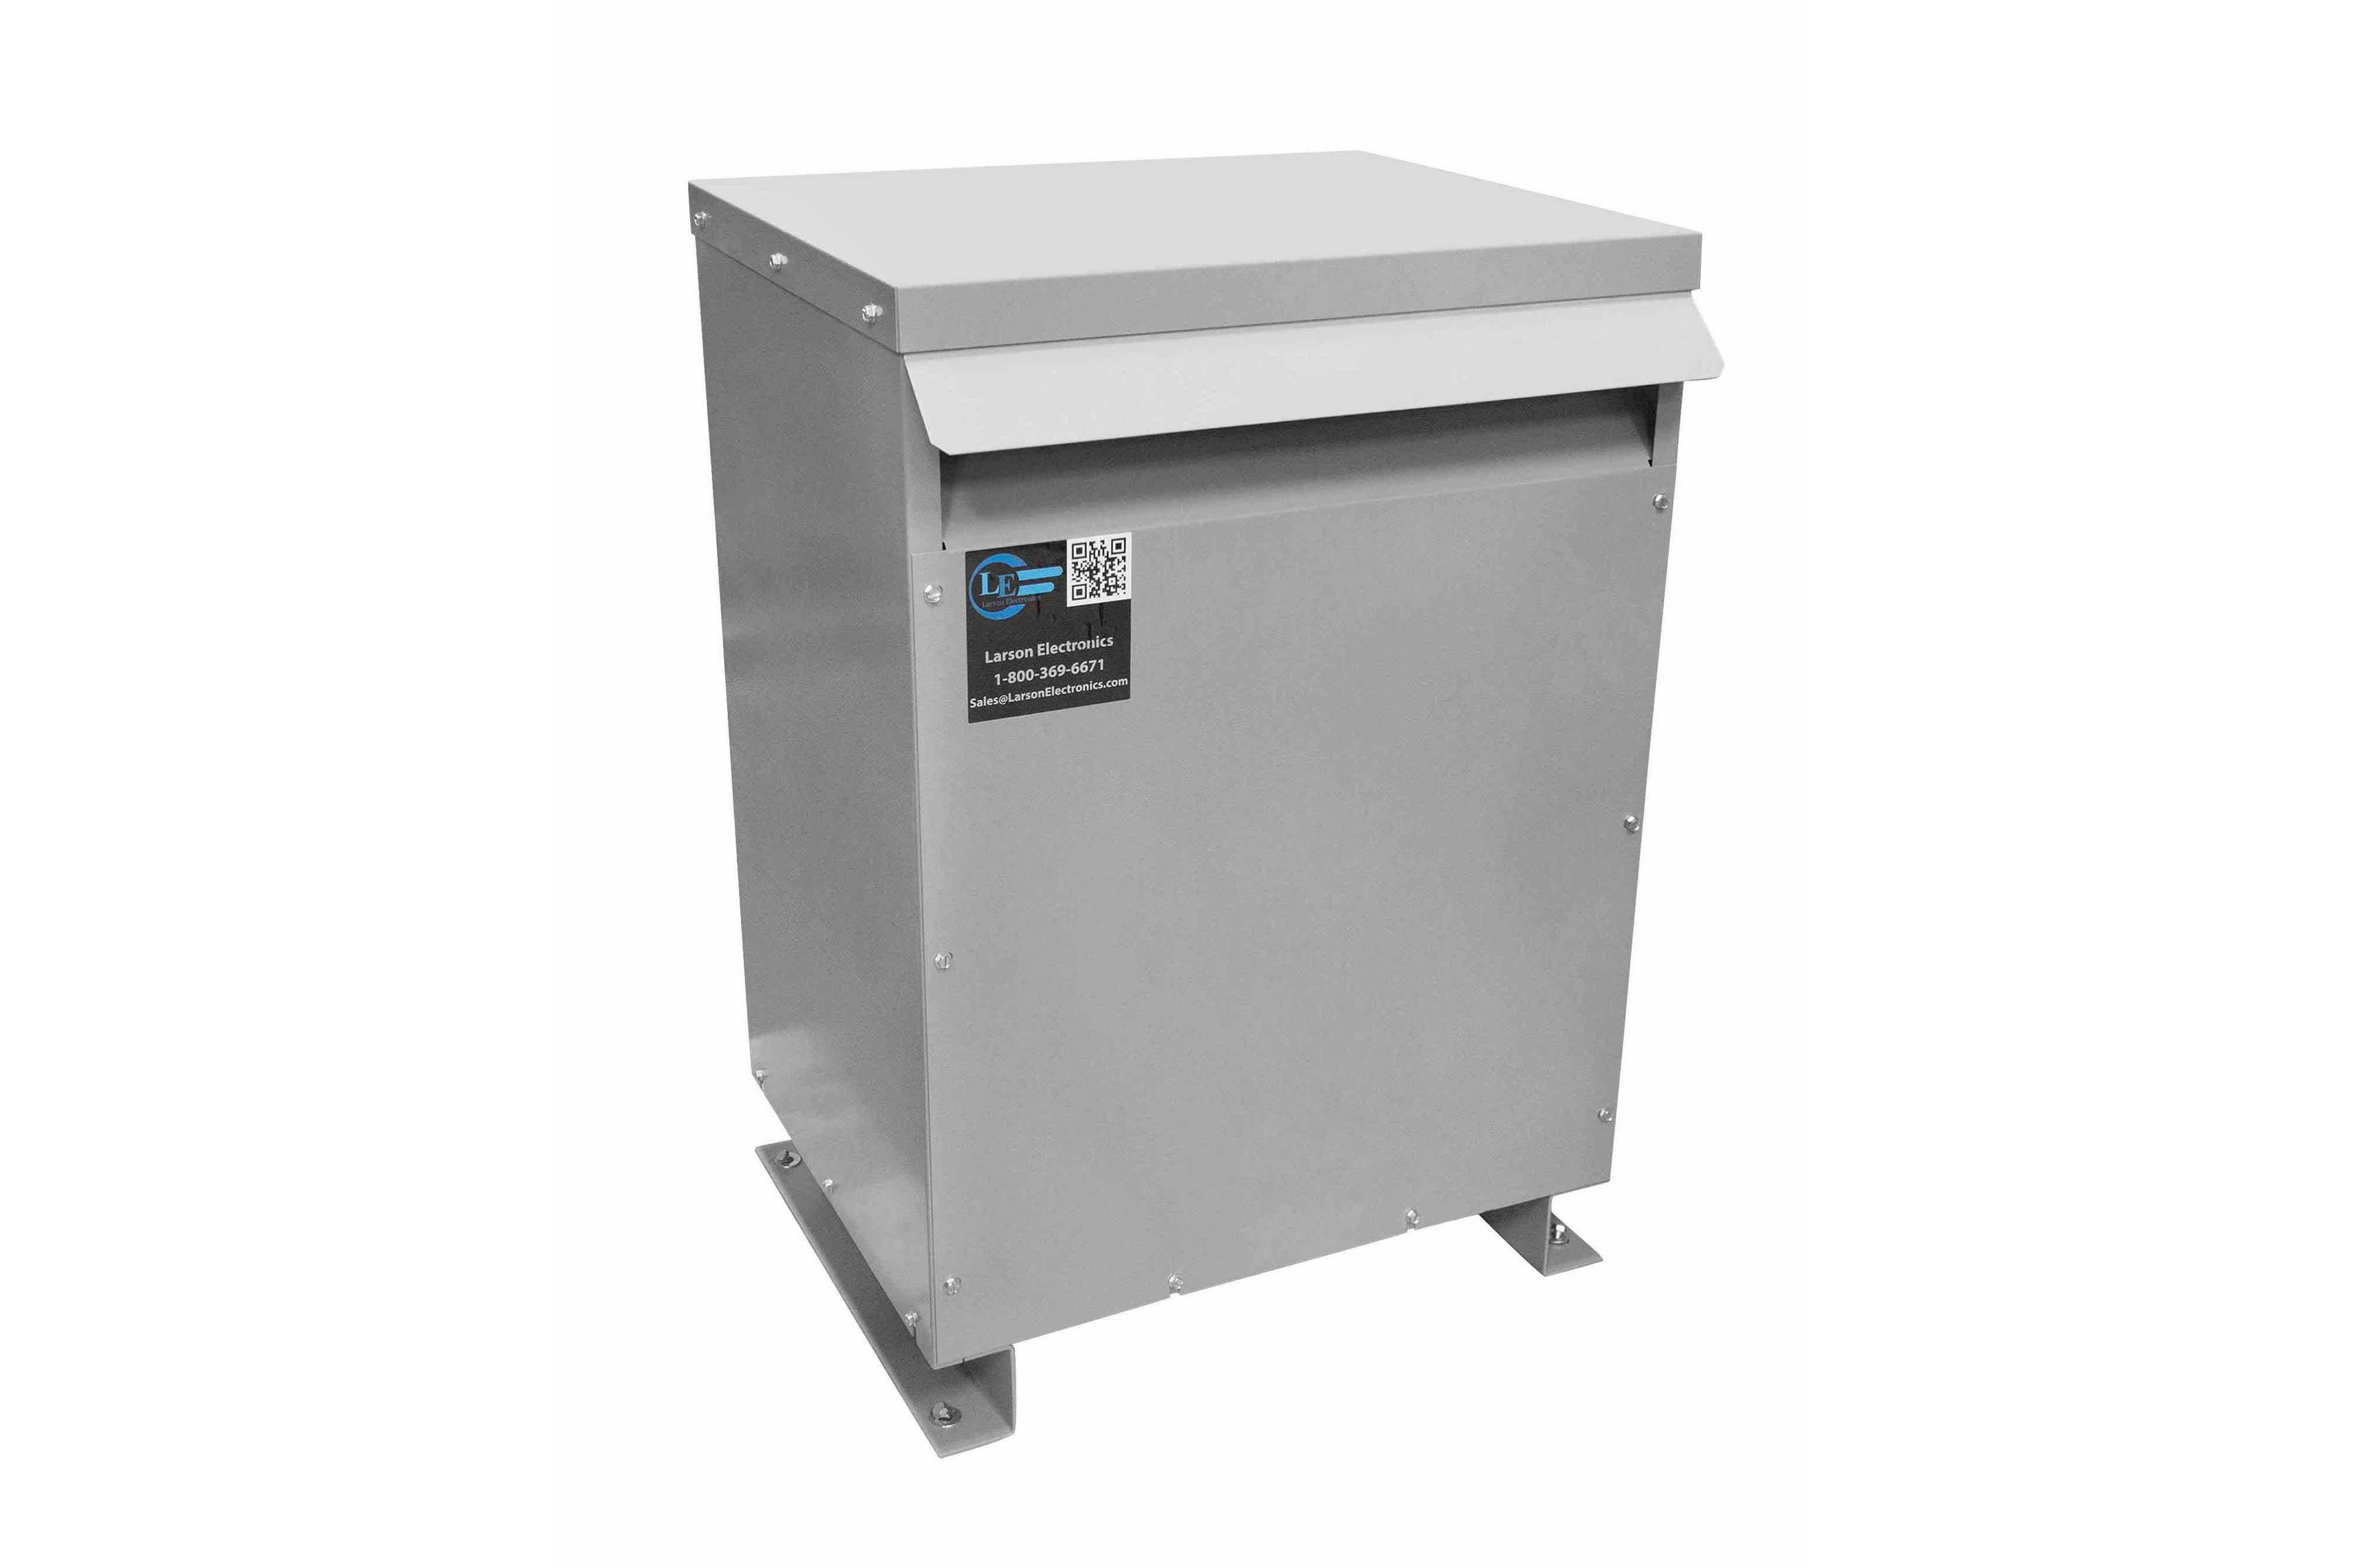 225 kVA 3PH DOE Transformer, 480V Delta Primary, 480Y/277 Wye-N Secondary, N3R, Ventilated, 60 Hz